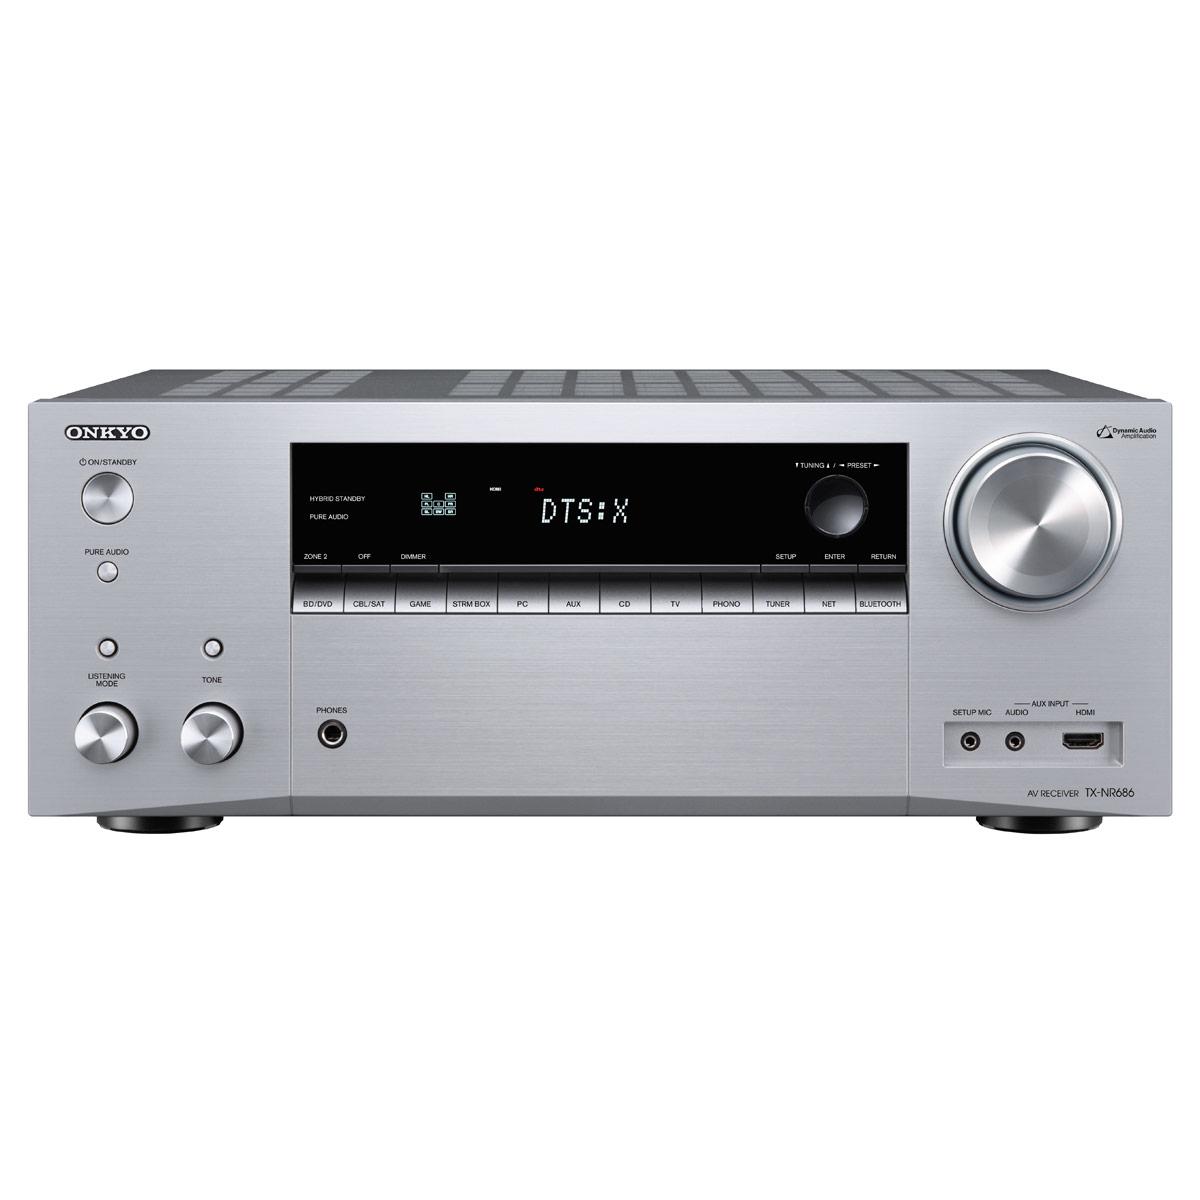 Ampli home cinéma Onkyo TX-NR686E Argent Ampli-tuner Home Cinéma 7.2 - 165 Watts - THX - Wi-Fi/Bluetooth - Dolby Atmos - DTS:X - Multiroom - 4K/60p - HDCP 2.2 - AirPlay/Chromecast - Hi-Res Audio - 7 entrées HDMI